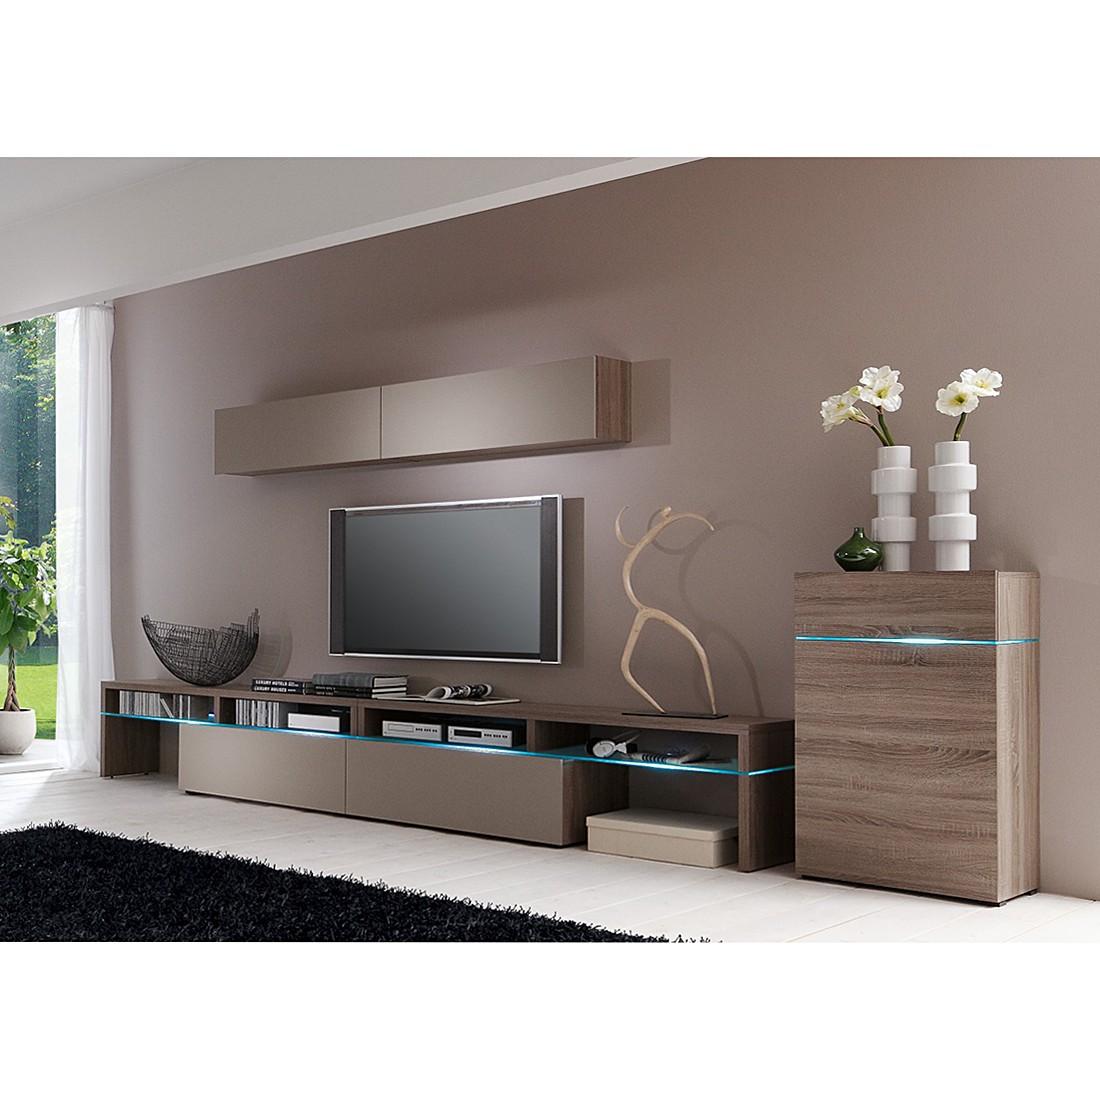 wohnwand colourart 4 teilig eiche sonoma tr ffel dekor congo ohne beleuchtung cs schmal. Black Bedroom Furniture Sets. Home Design Ideas